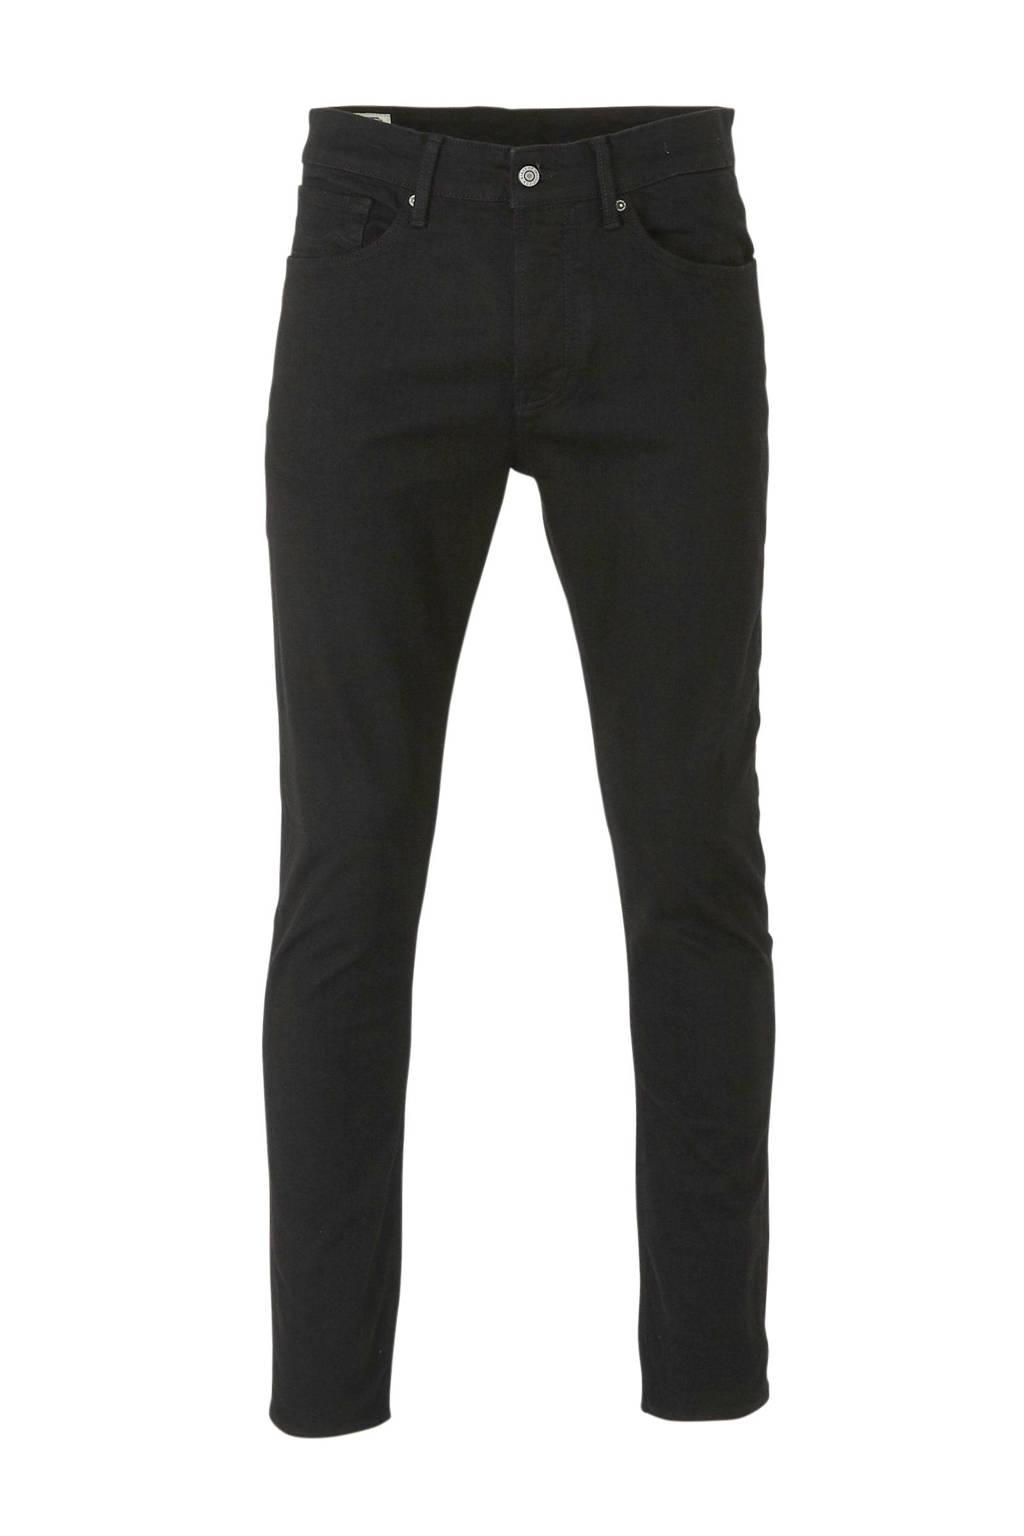 Kings of Indigo slim fit jeans John black rinse, Black rinse